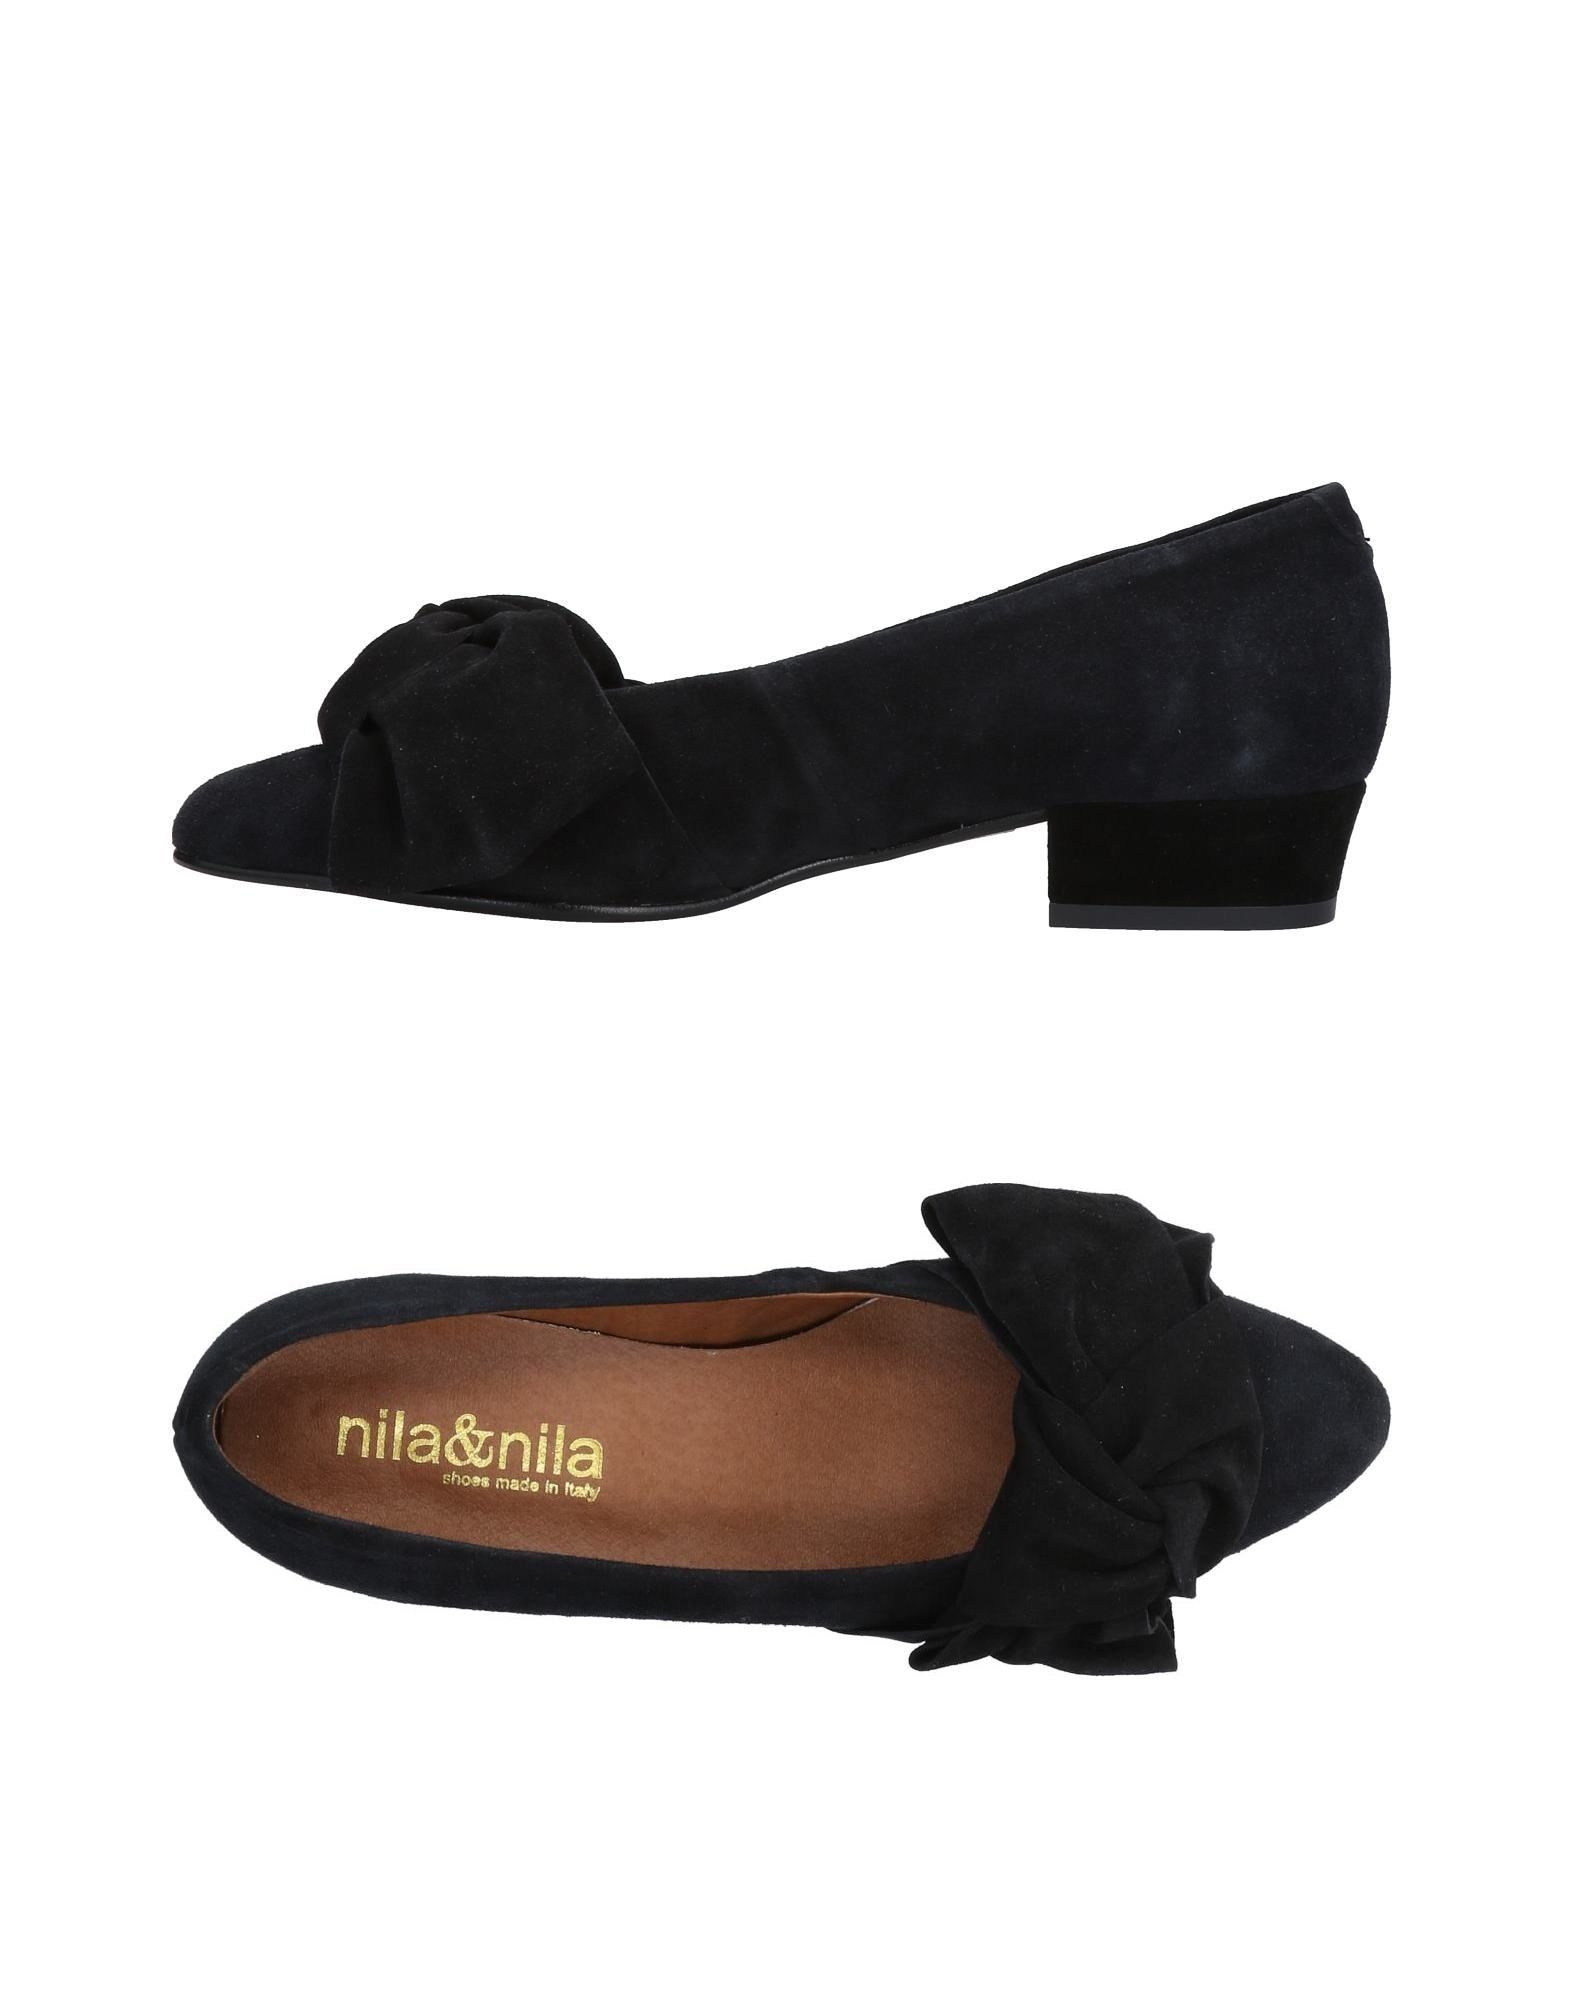 Nila & Nila Pumps Damen Schuhe  11476771VS Neue Schuhe Damen 22d001